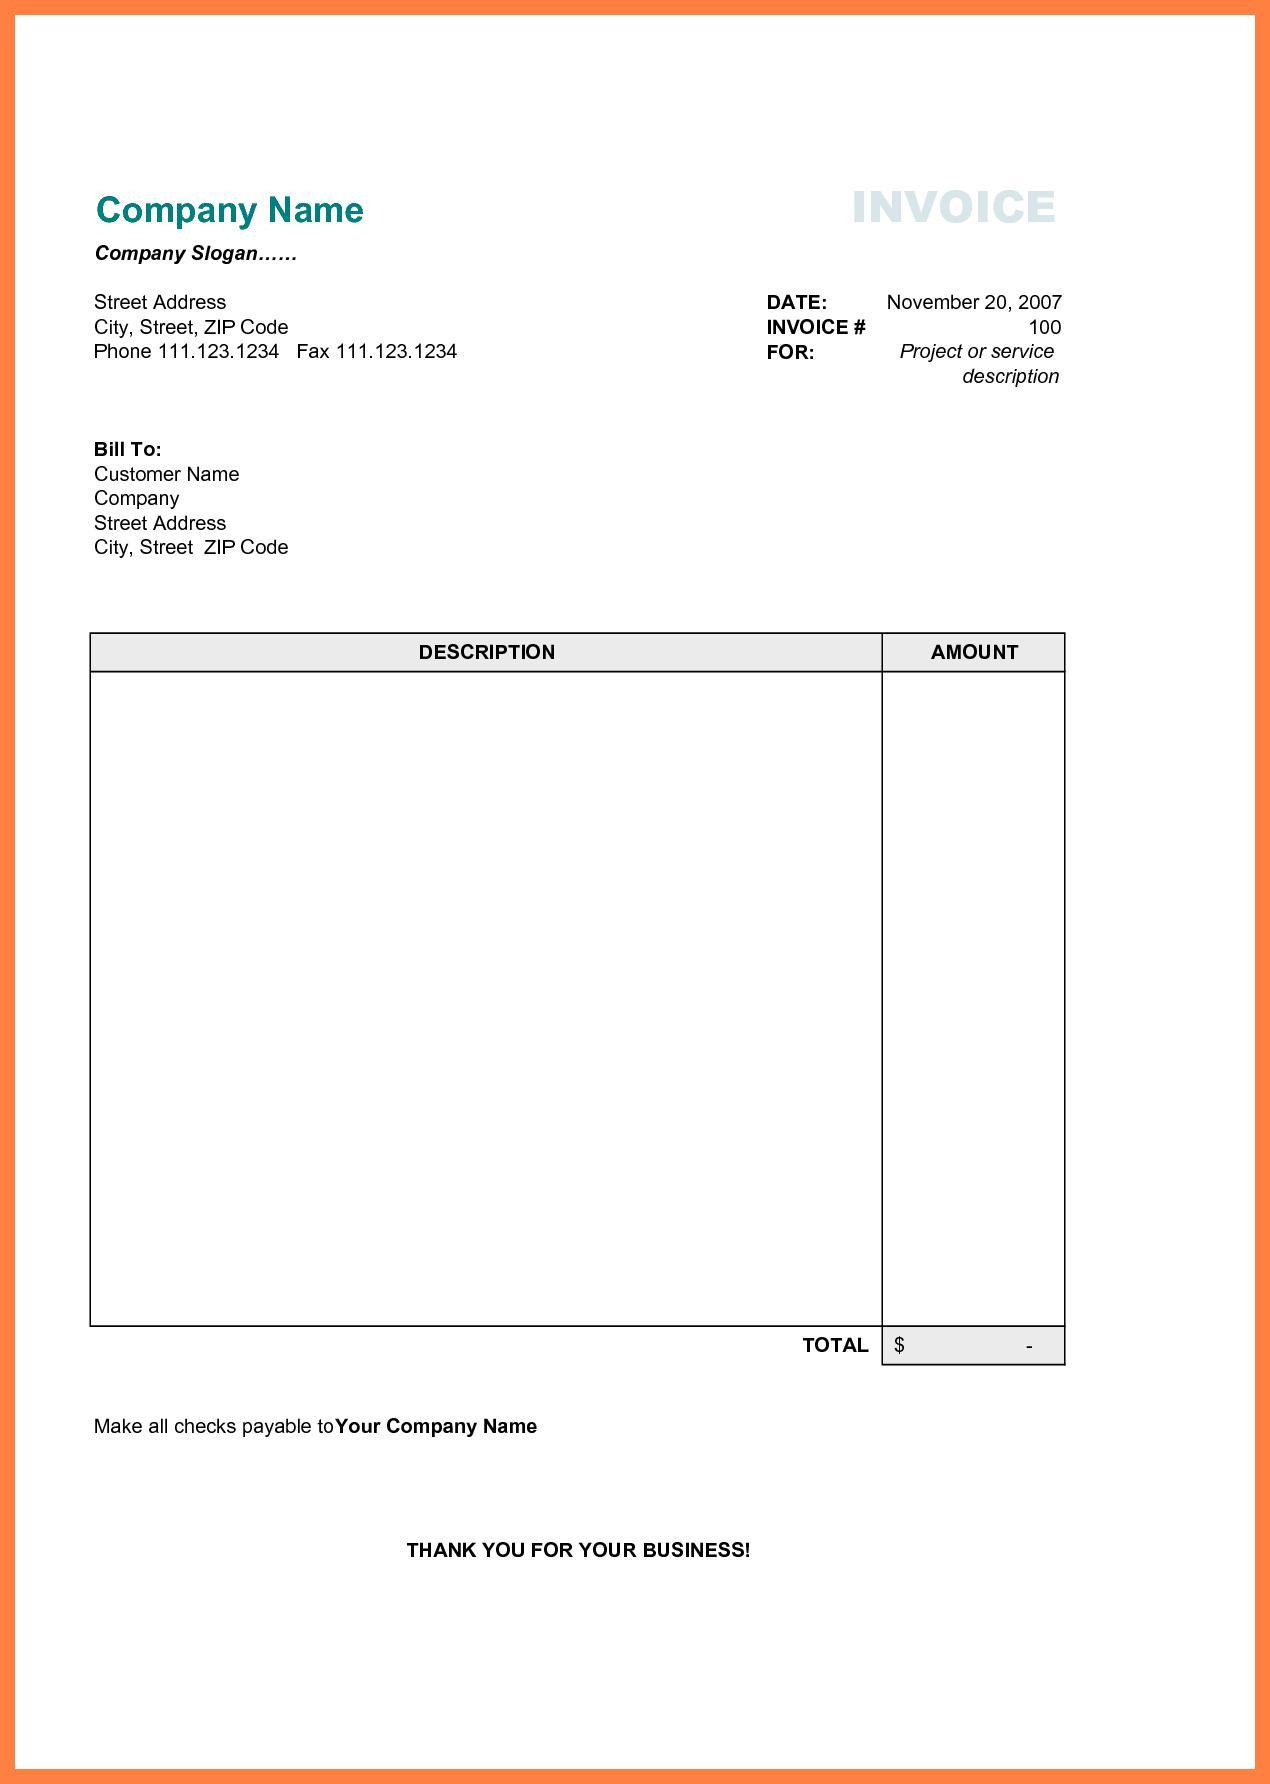 Blank Proforma Invoice Format